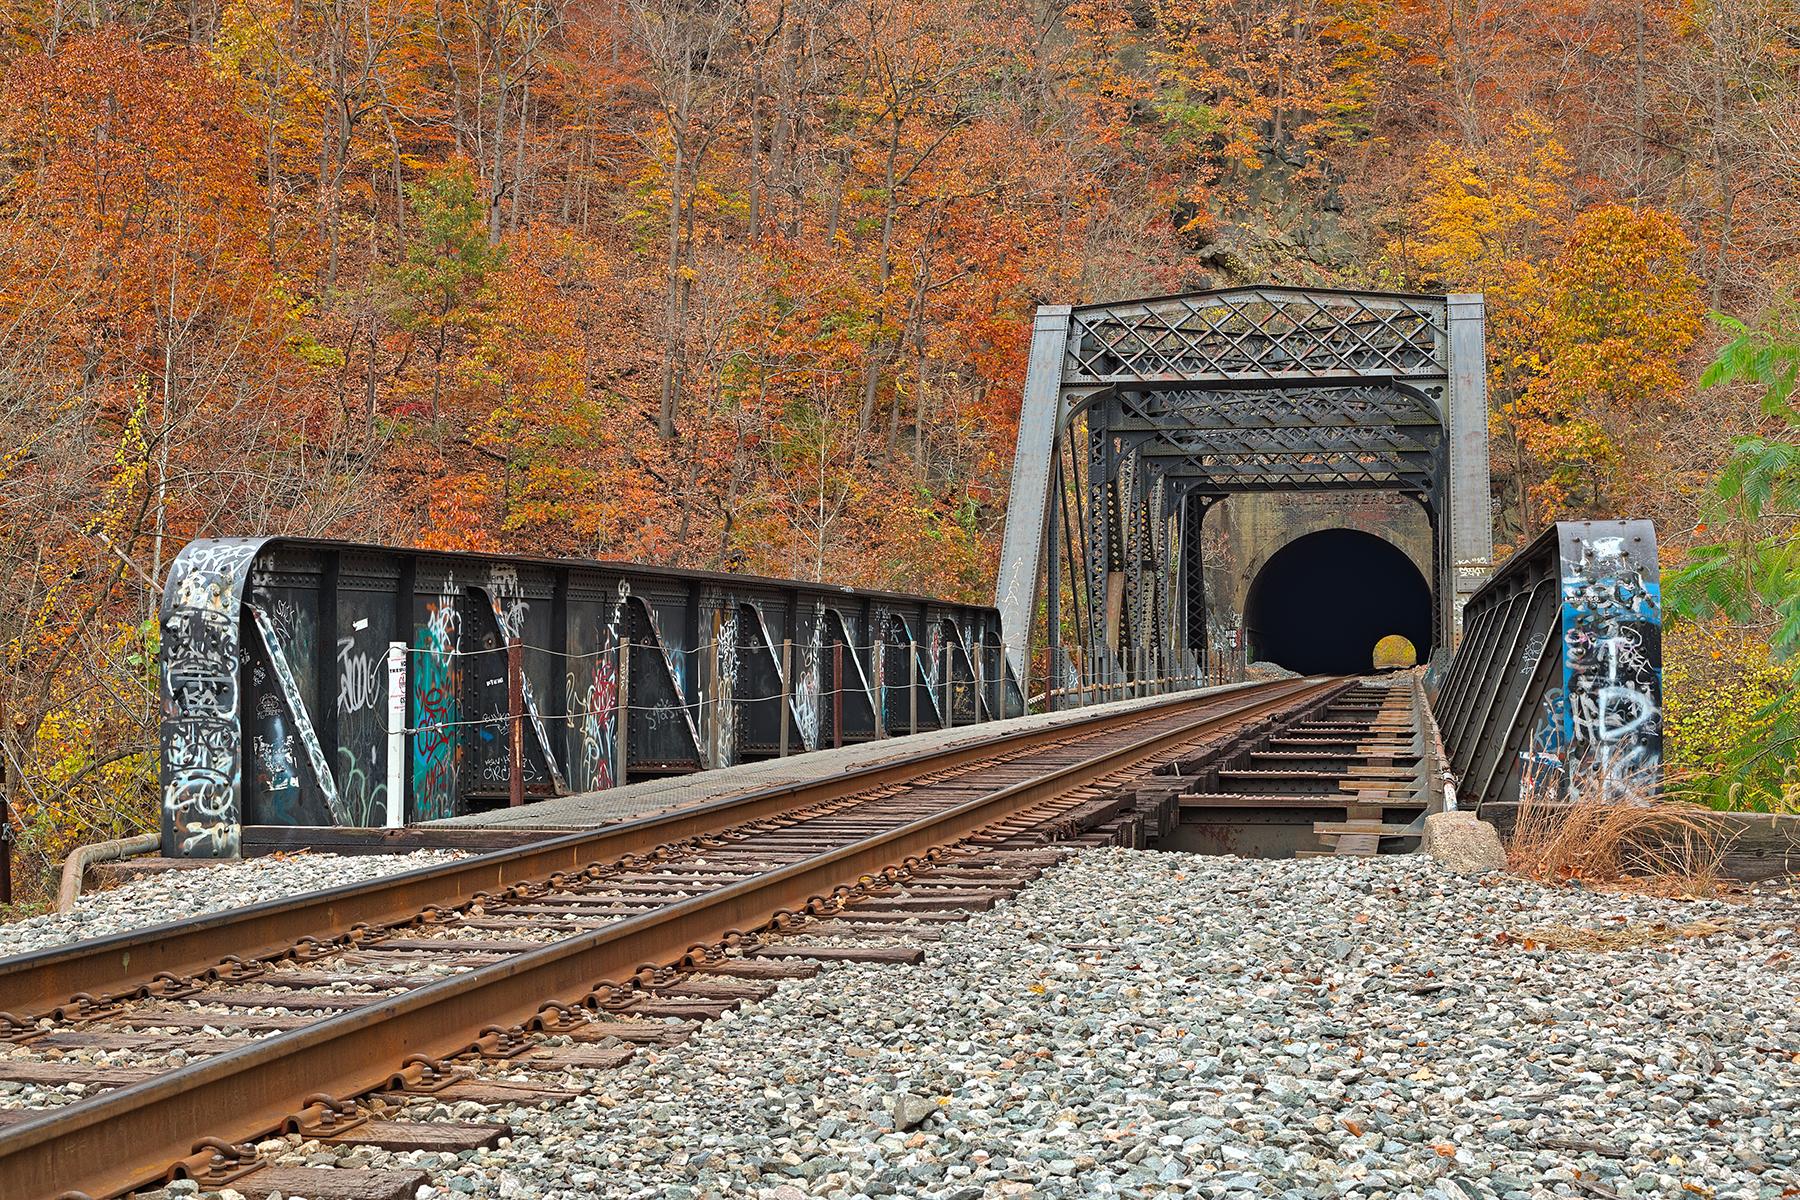 Autumn Graffiti Train Track - HDR, Age, Passage, Railway, Rails, HQ Photo